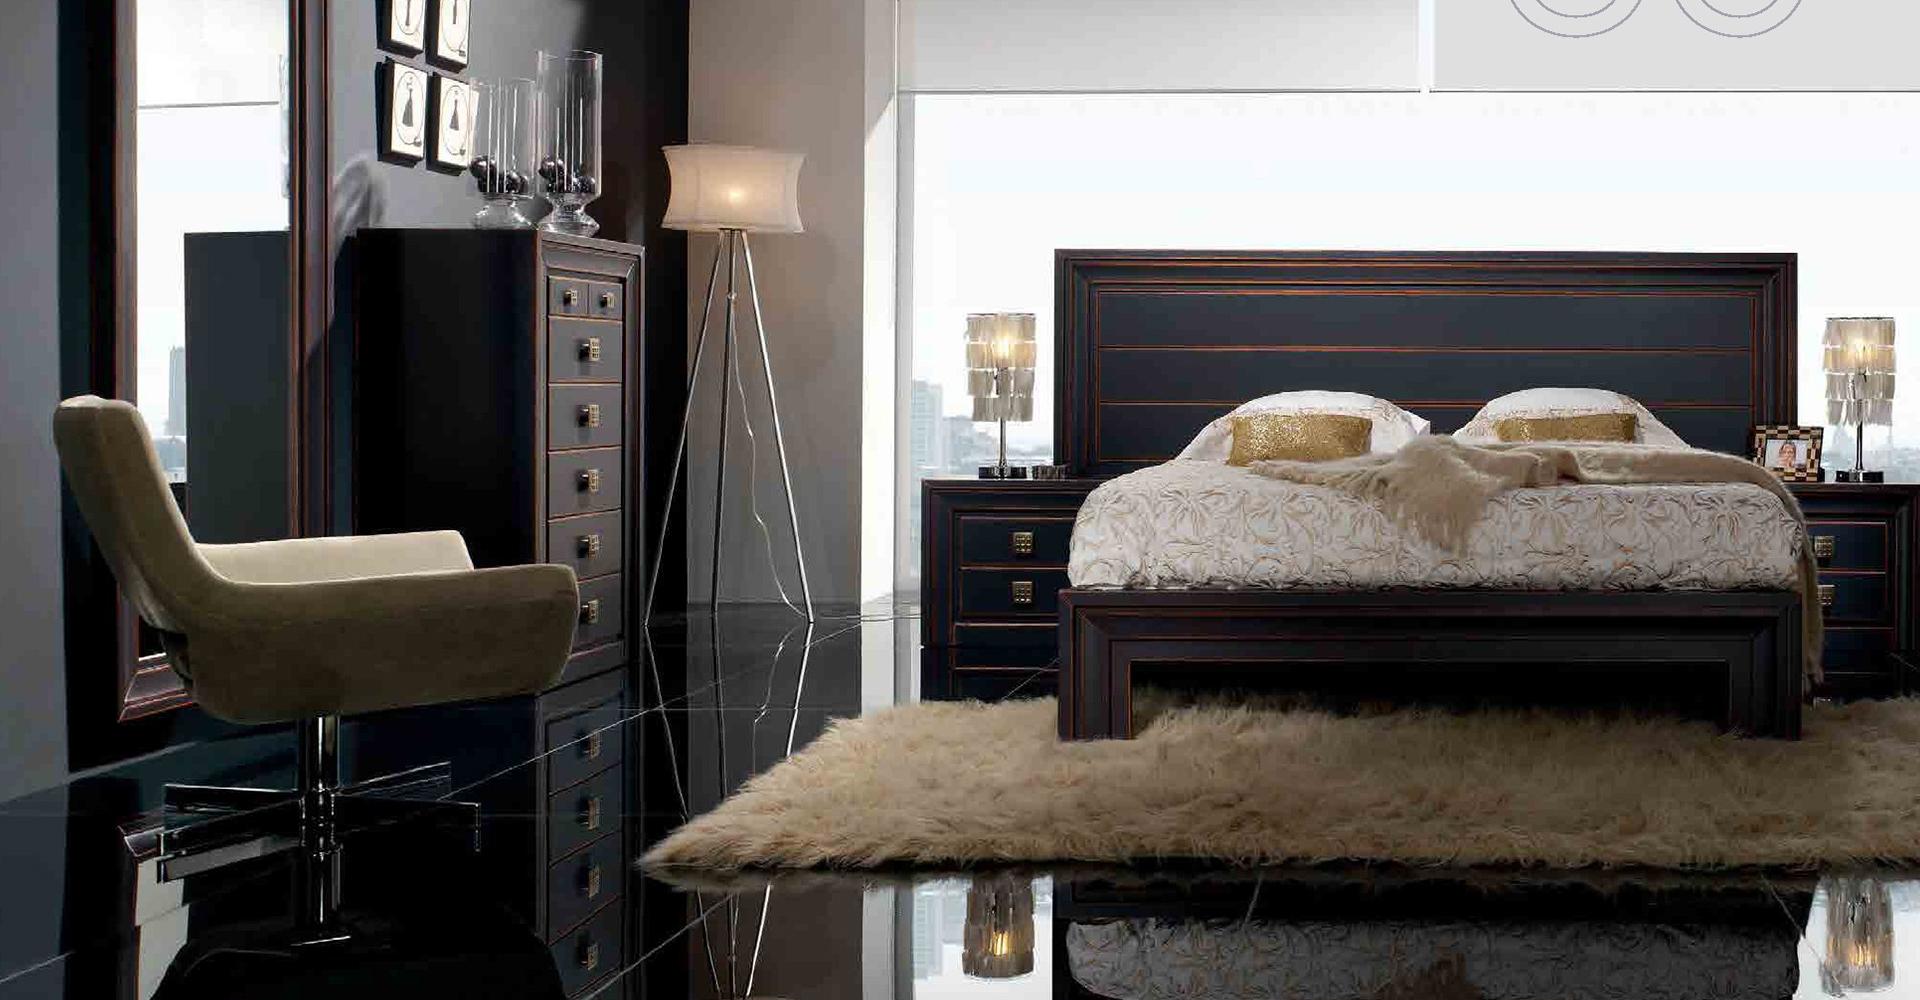 dormitorios de matrimonio de estilo clasico (49)